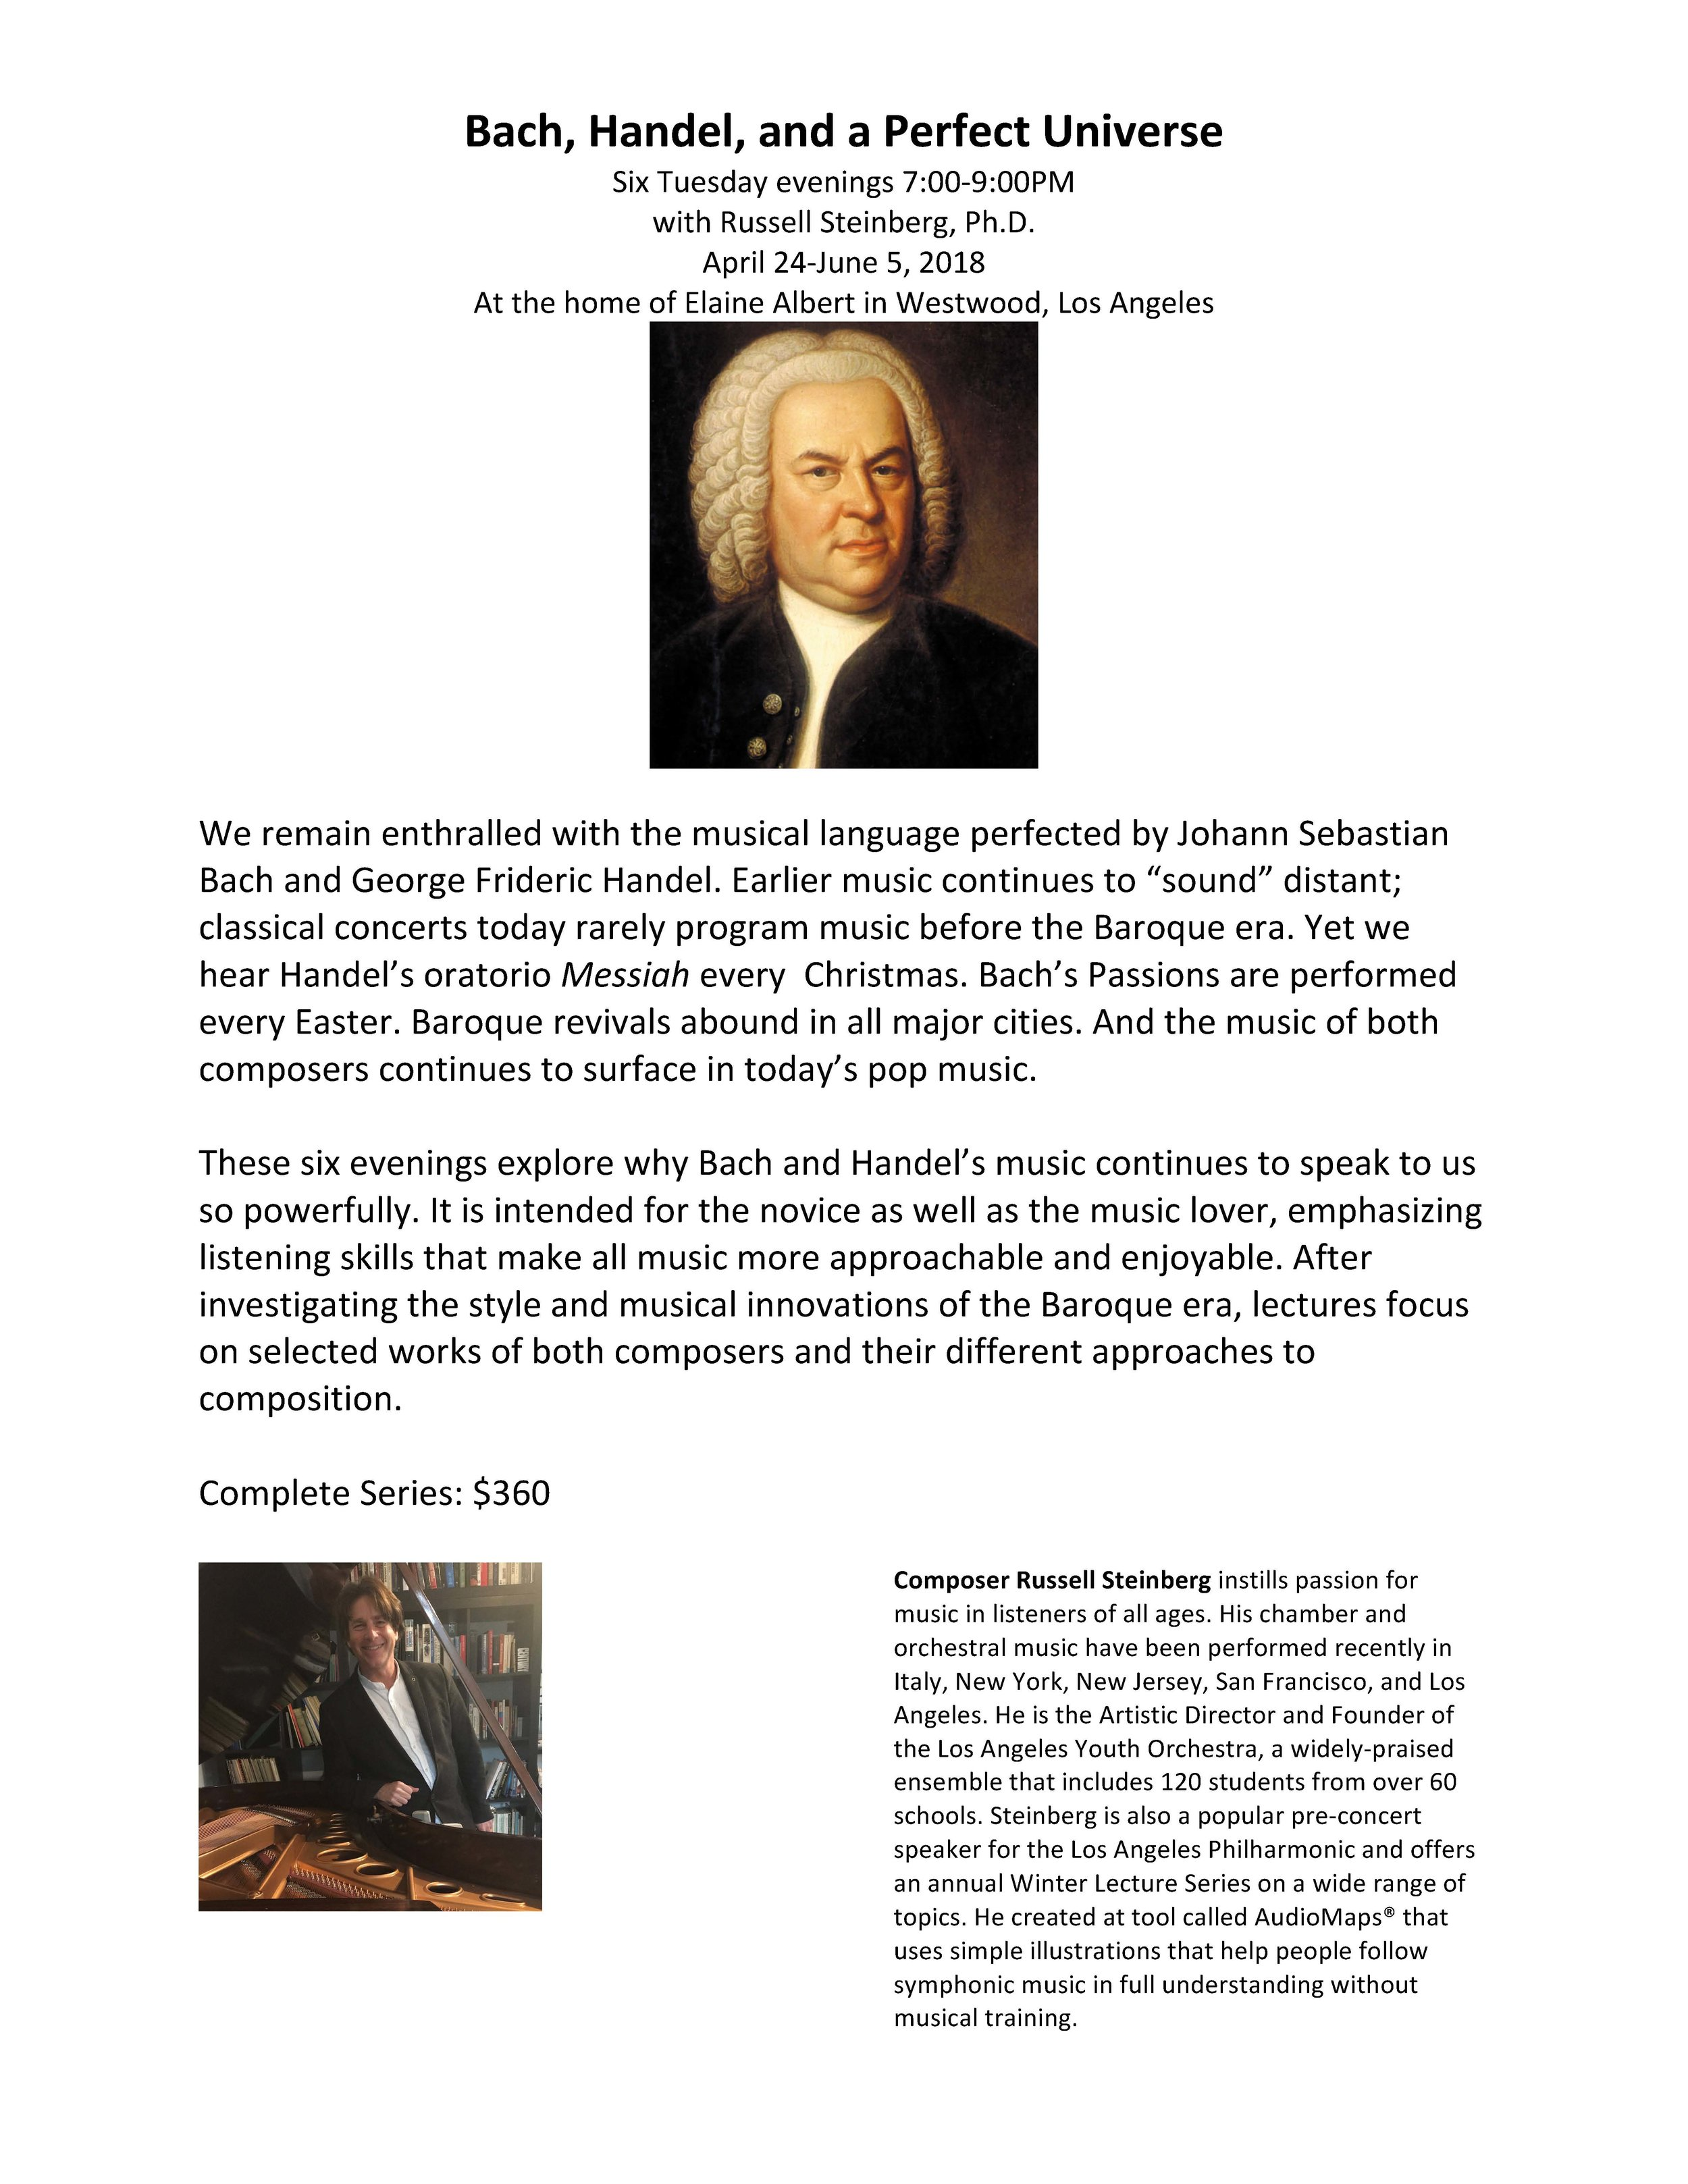 Bach-Handel Flyer 2018 series Tuesdays_Page_1.jpg